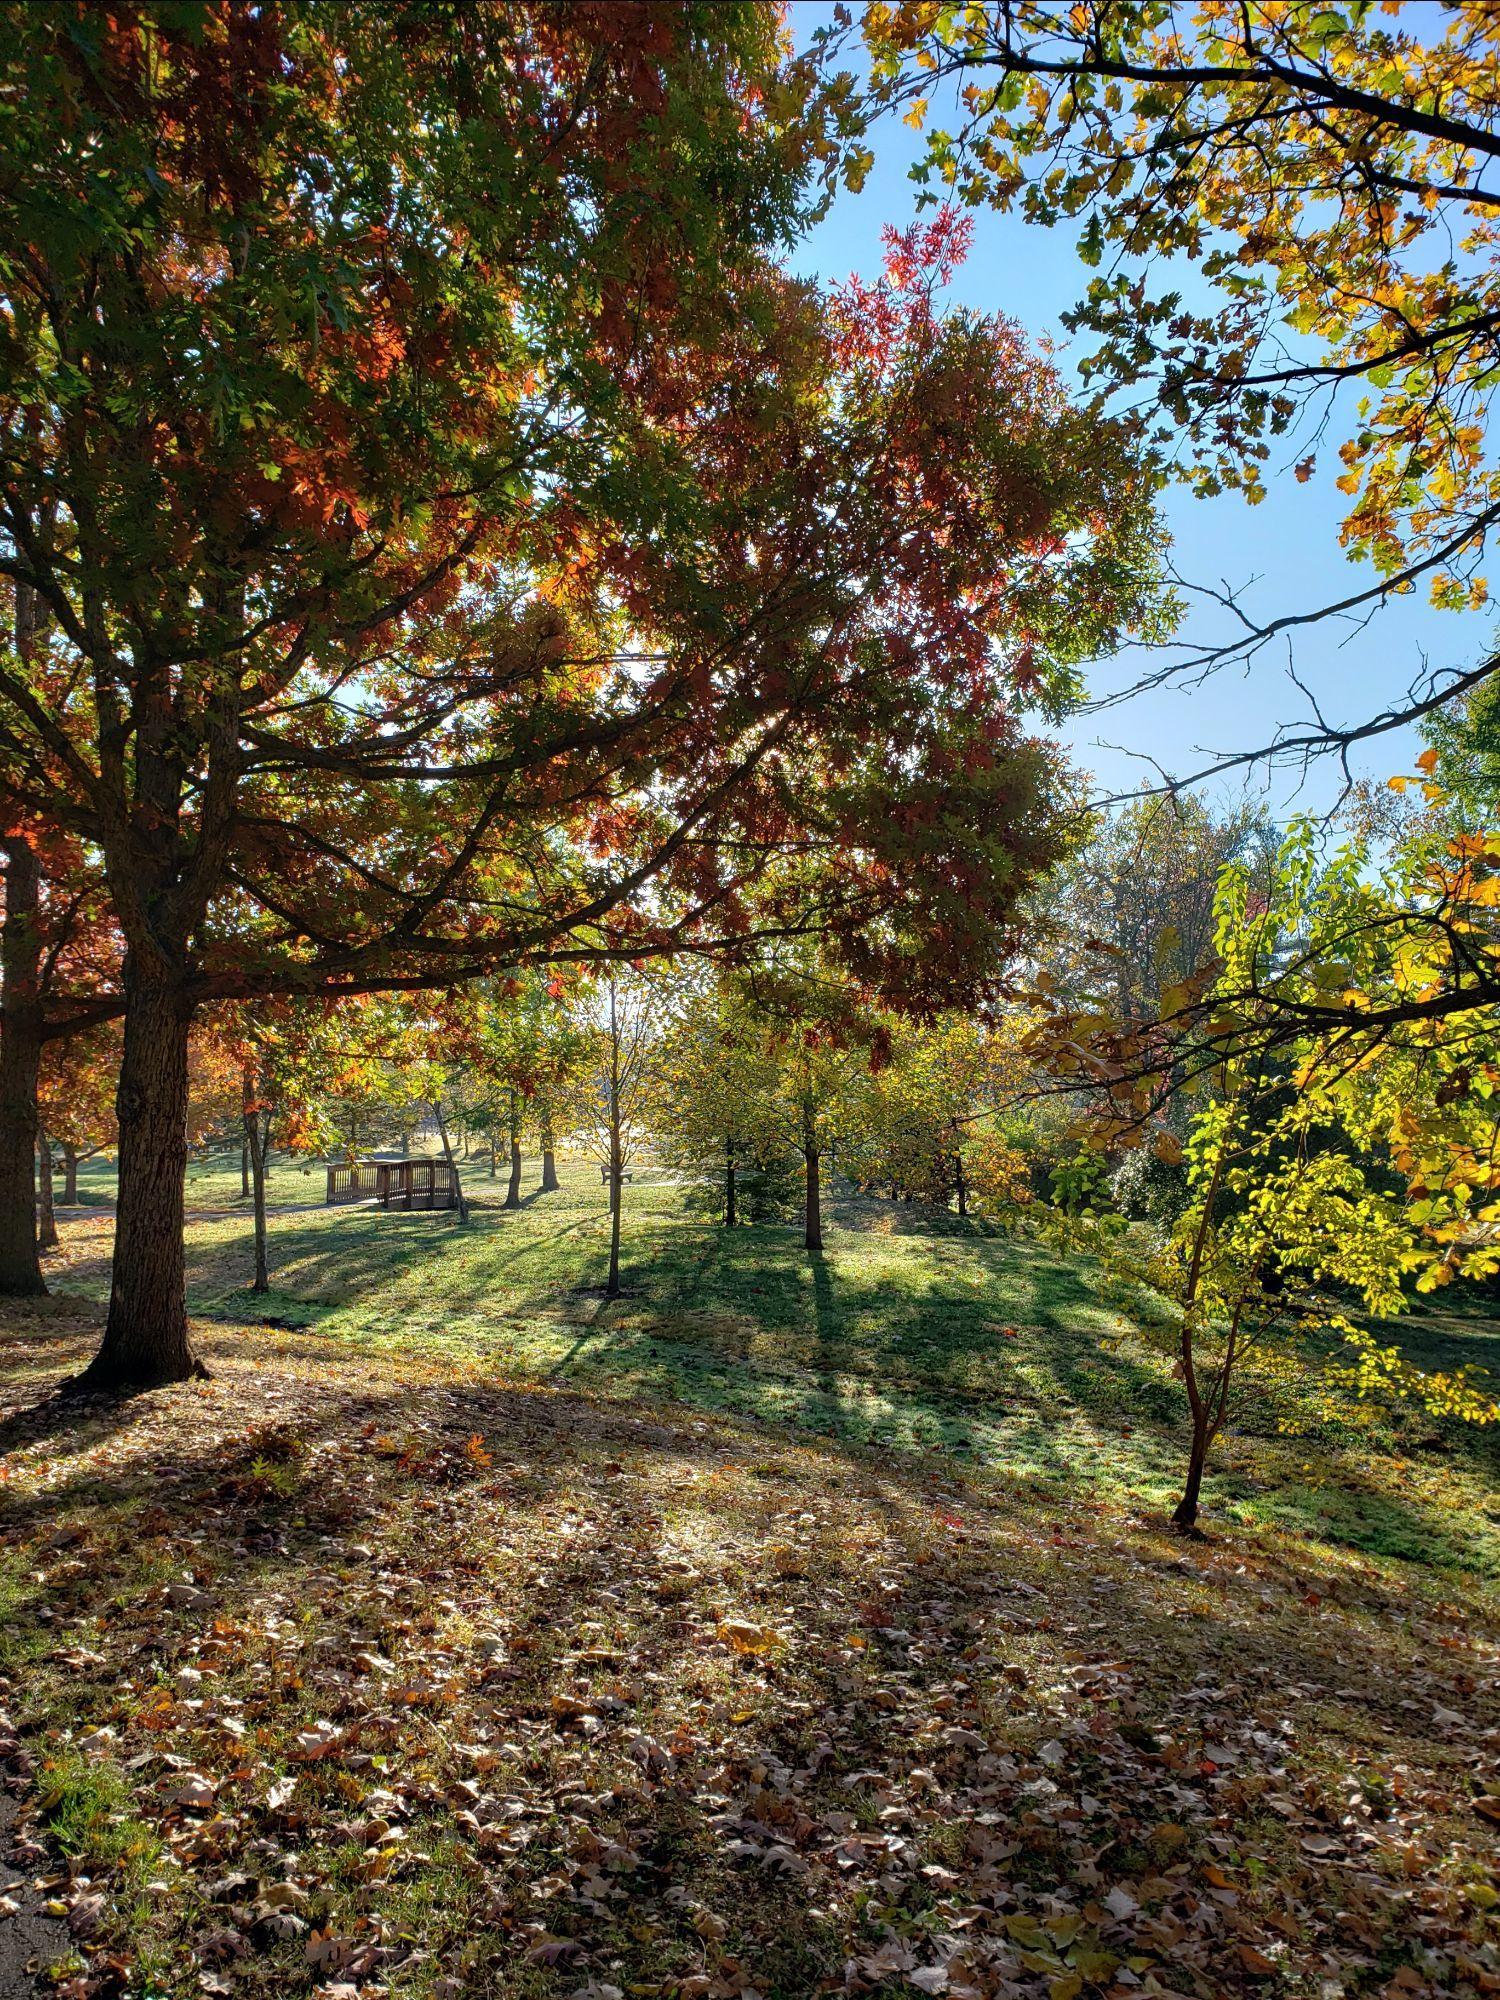 more fall in Ohio